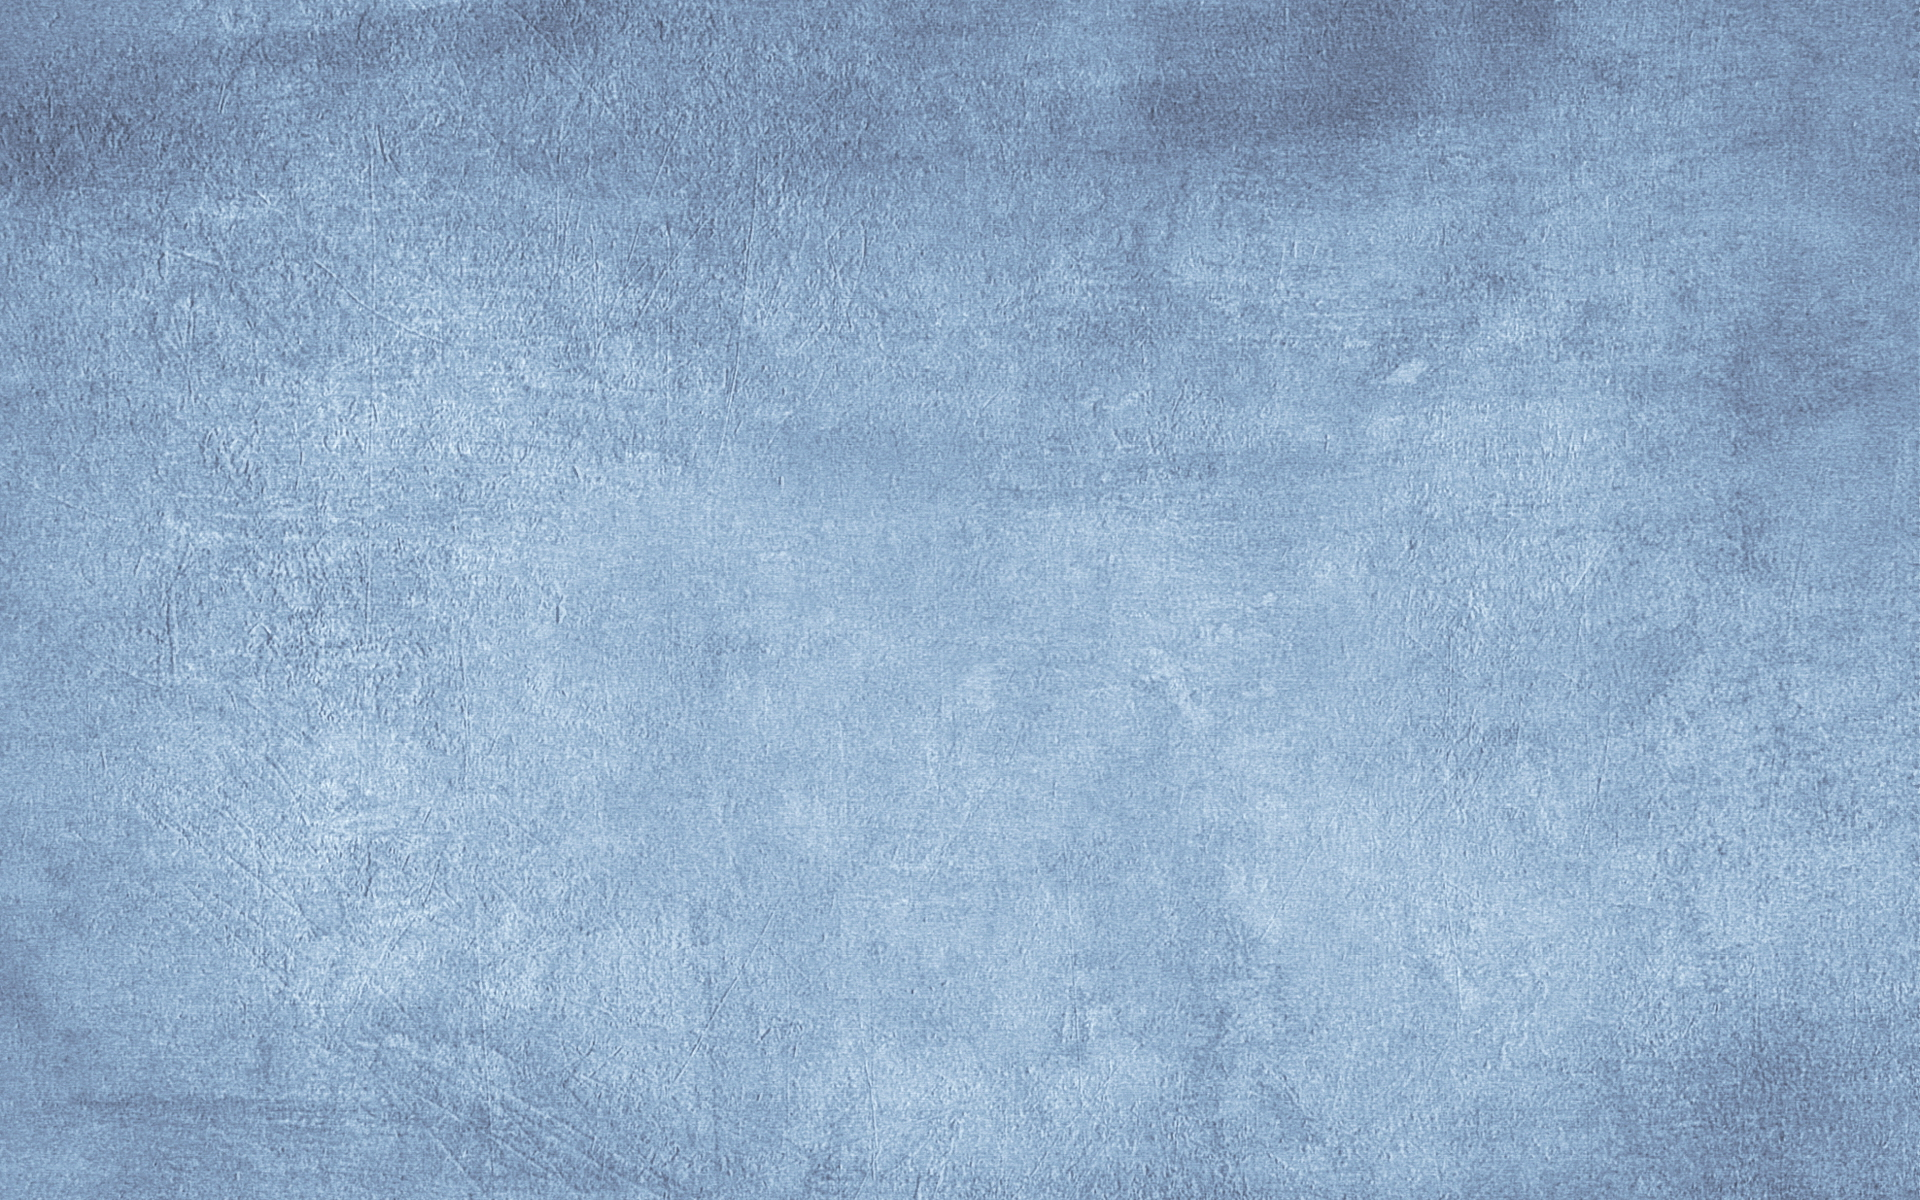 Рисовалка на фотографиях для айфонов арбуза